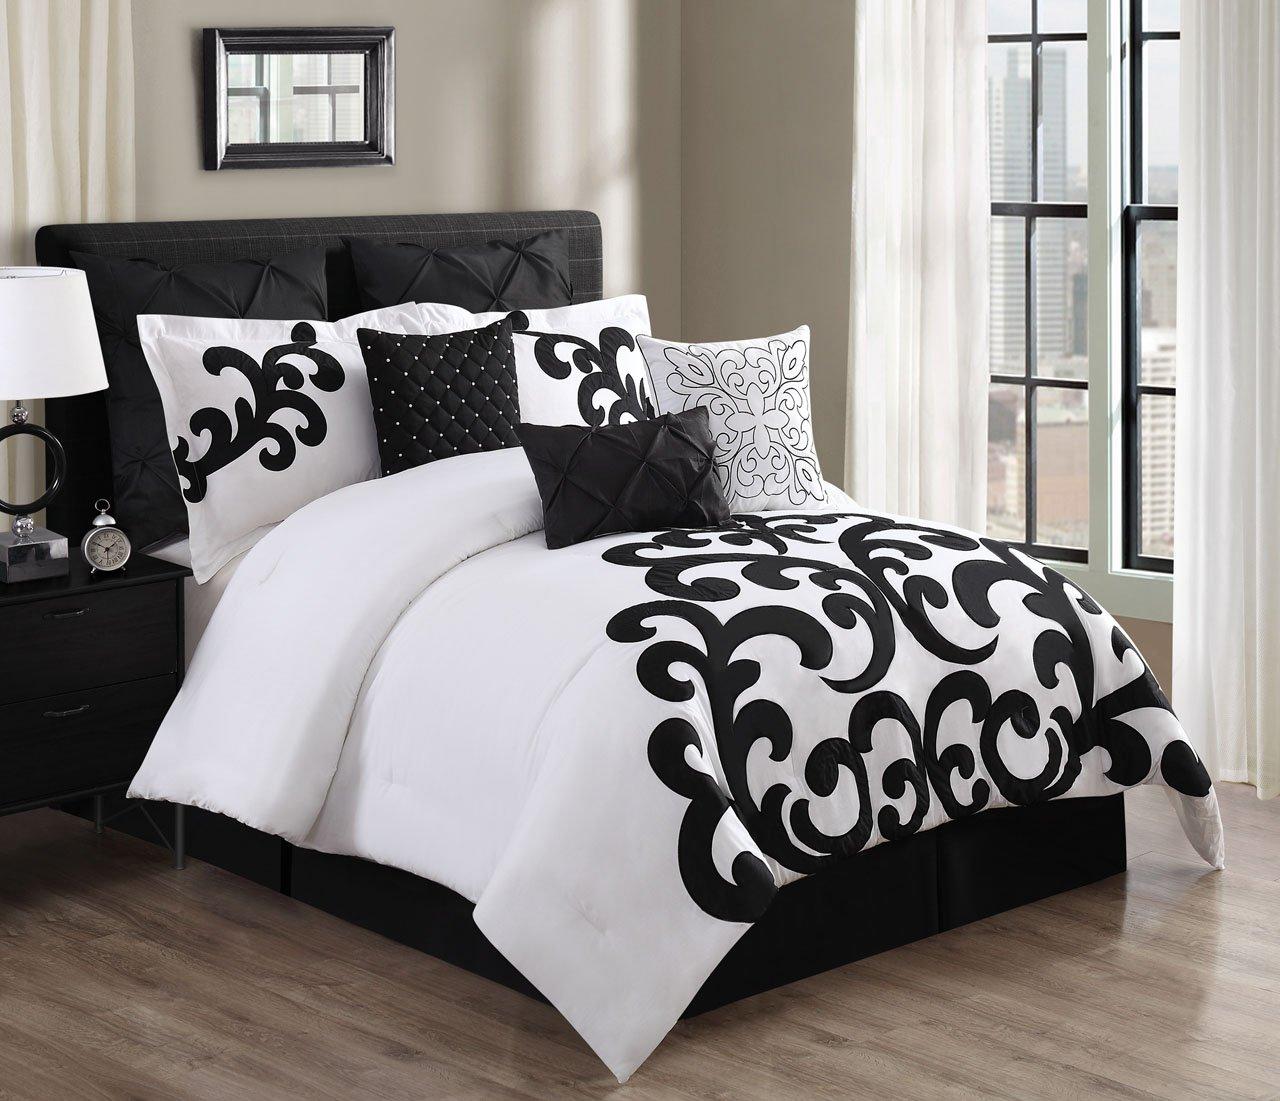 Amazon com kinglinen 9 piece empress 100 cotton black white comforter set queen home kitchen